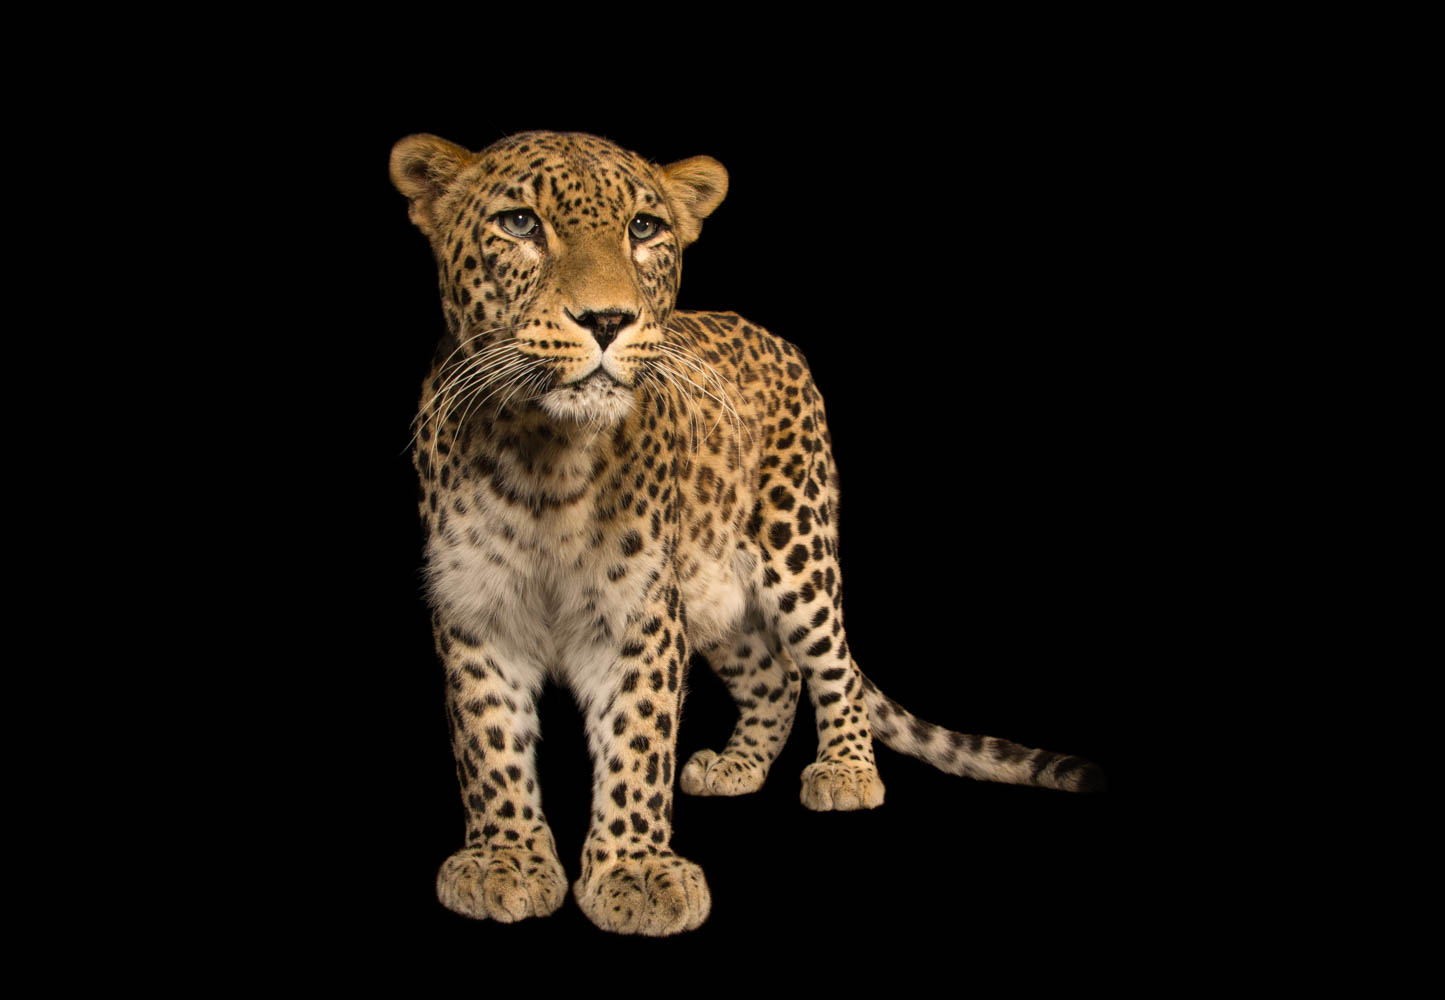 Persian Leopard - Panthera pardus saxicolor